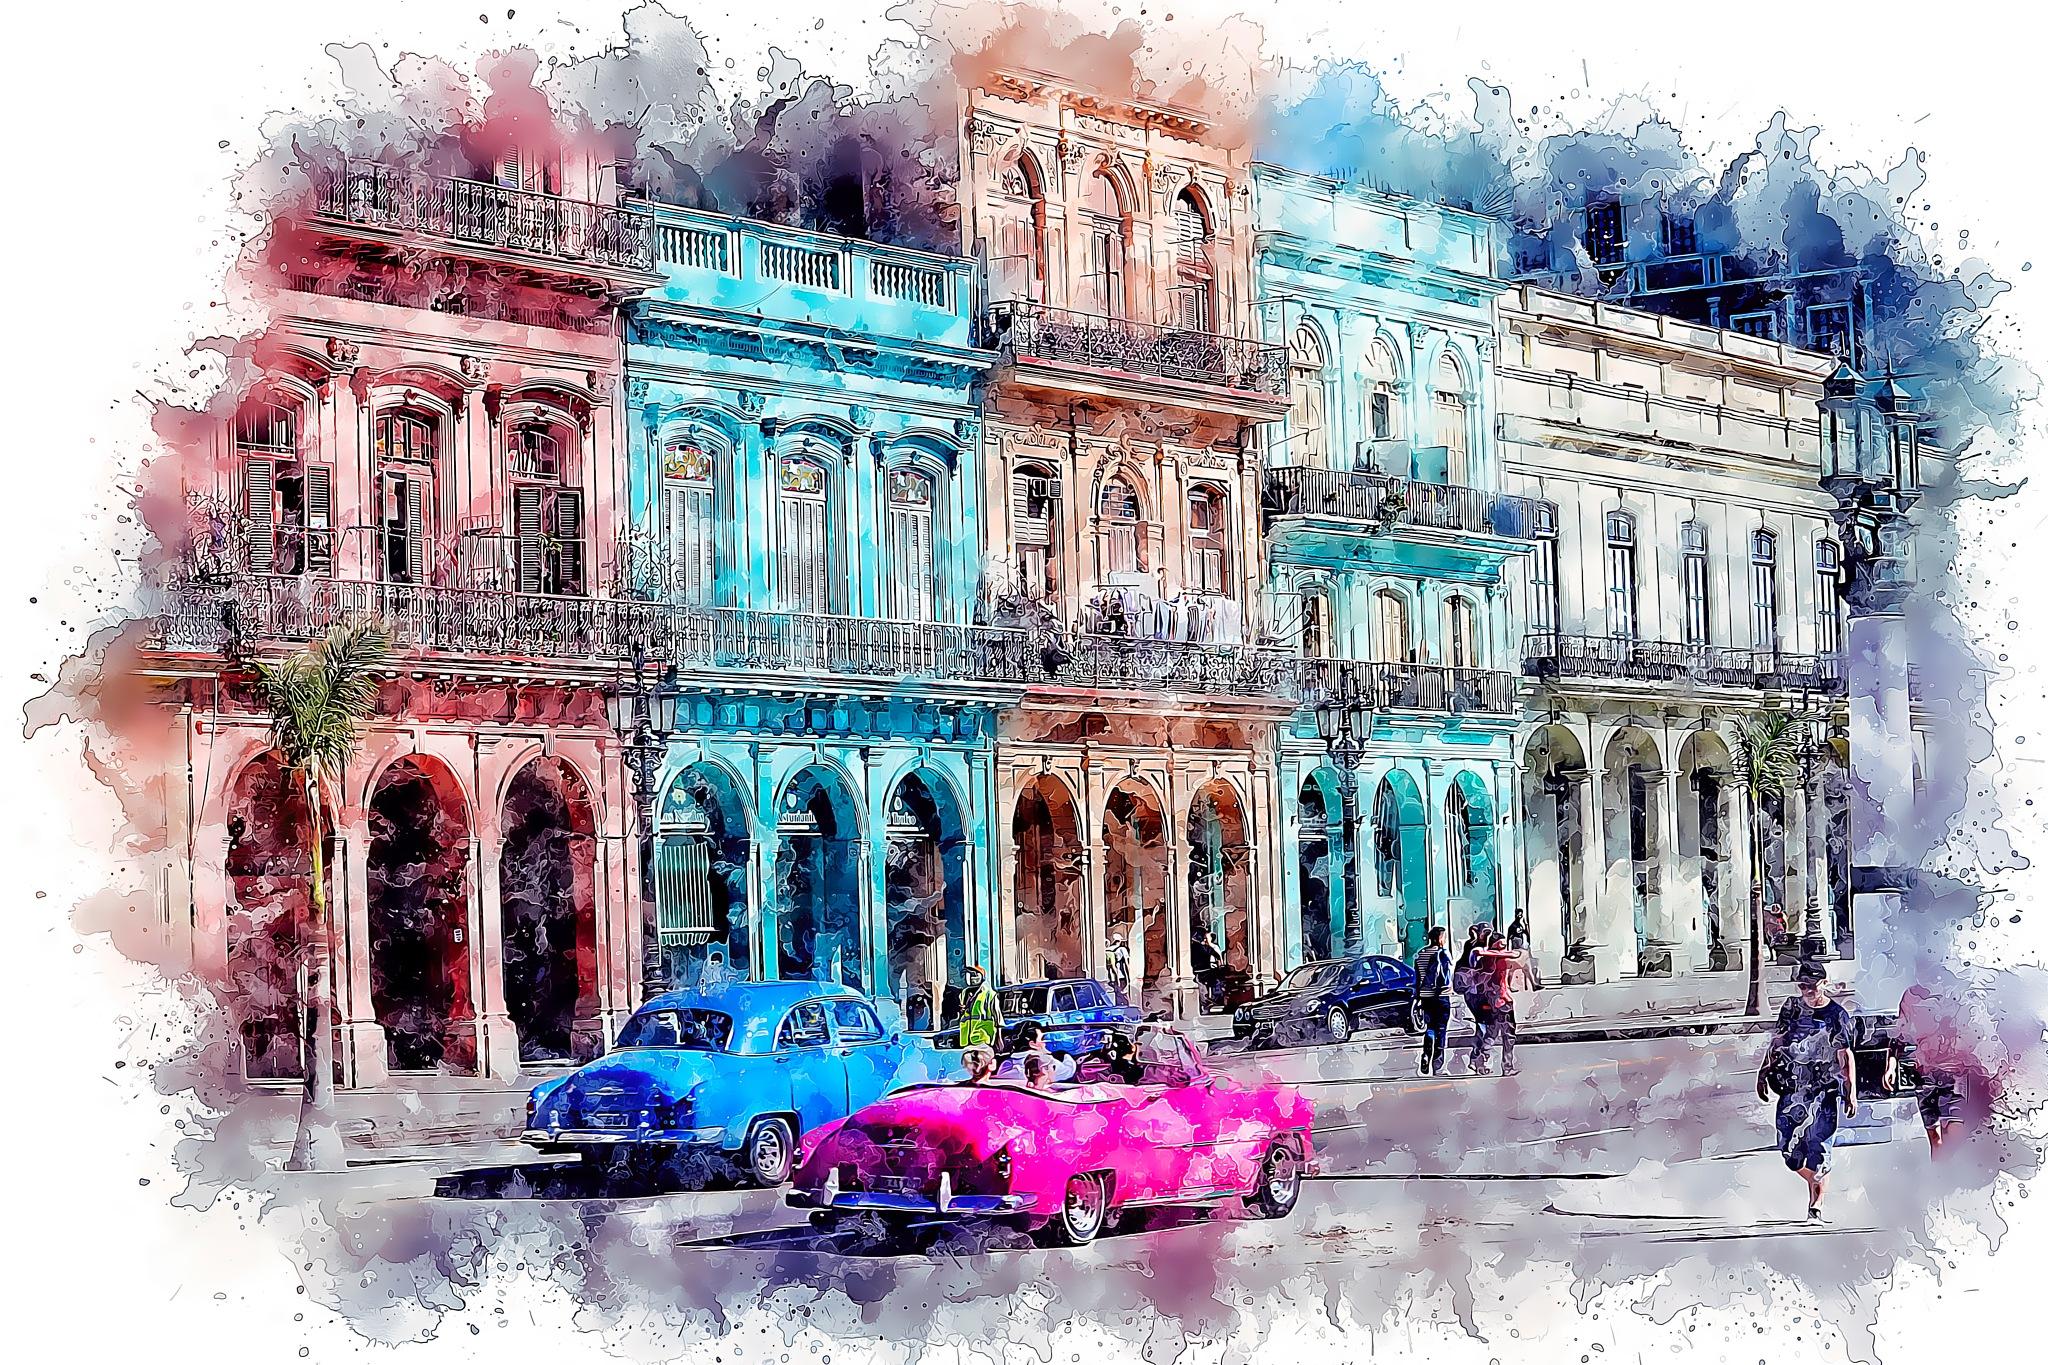 Havana by Art Tower Brigitte Werner